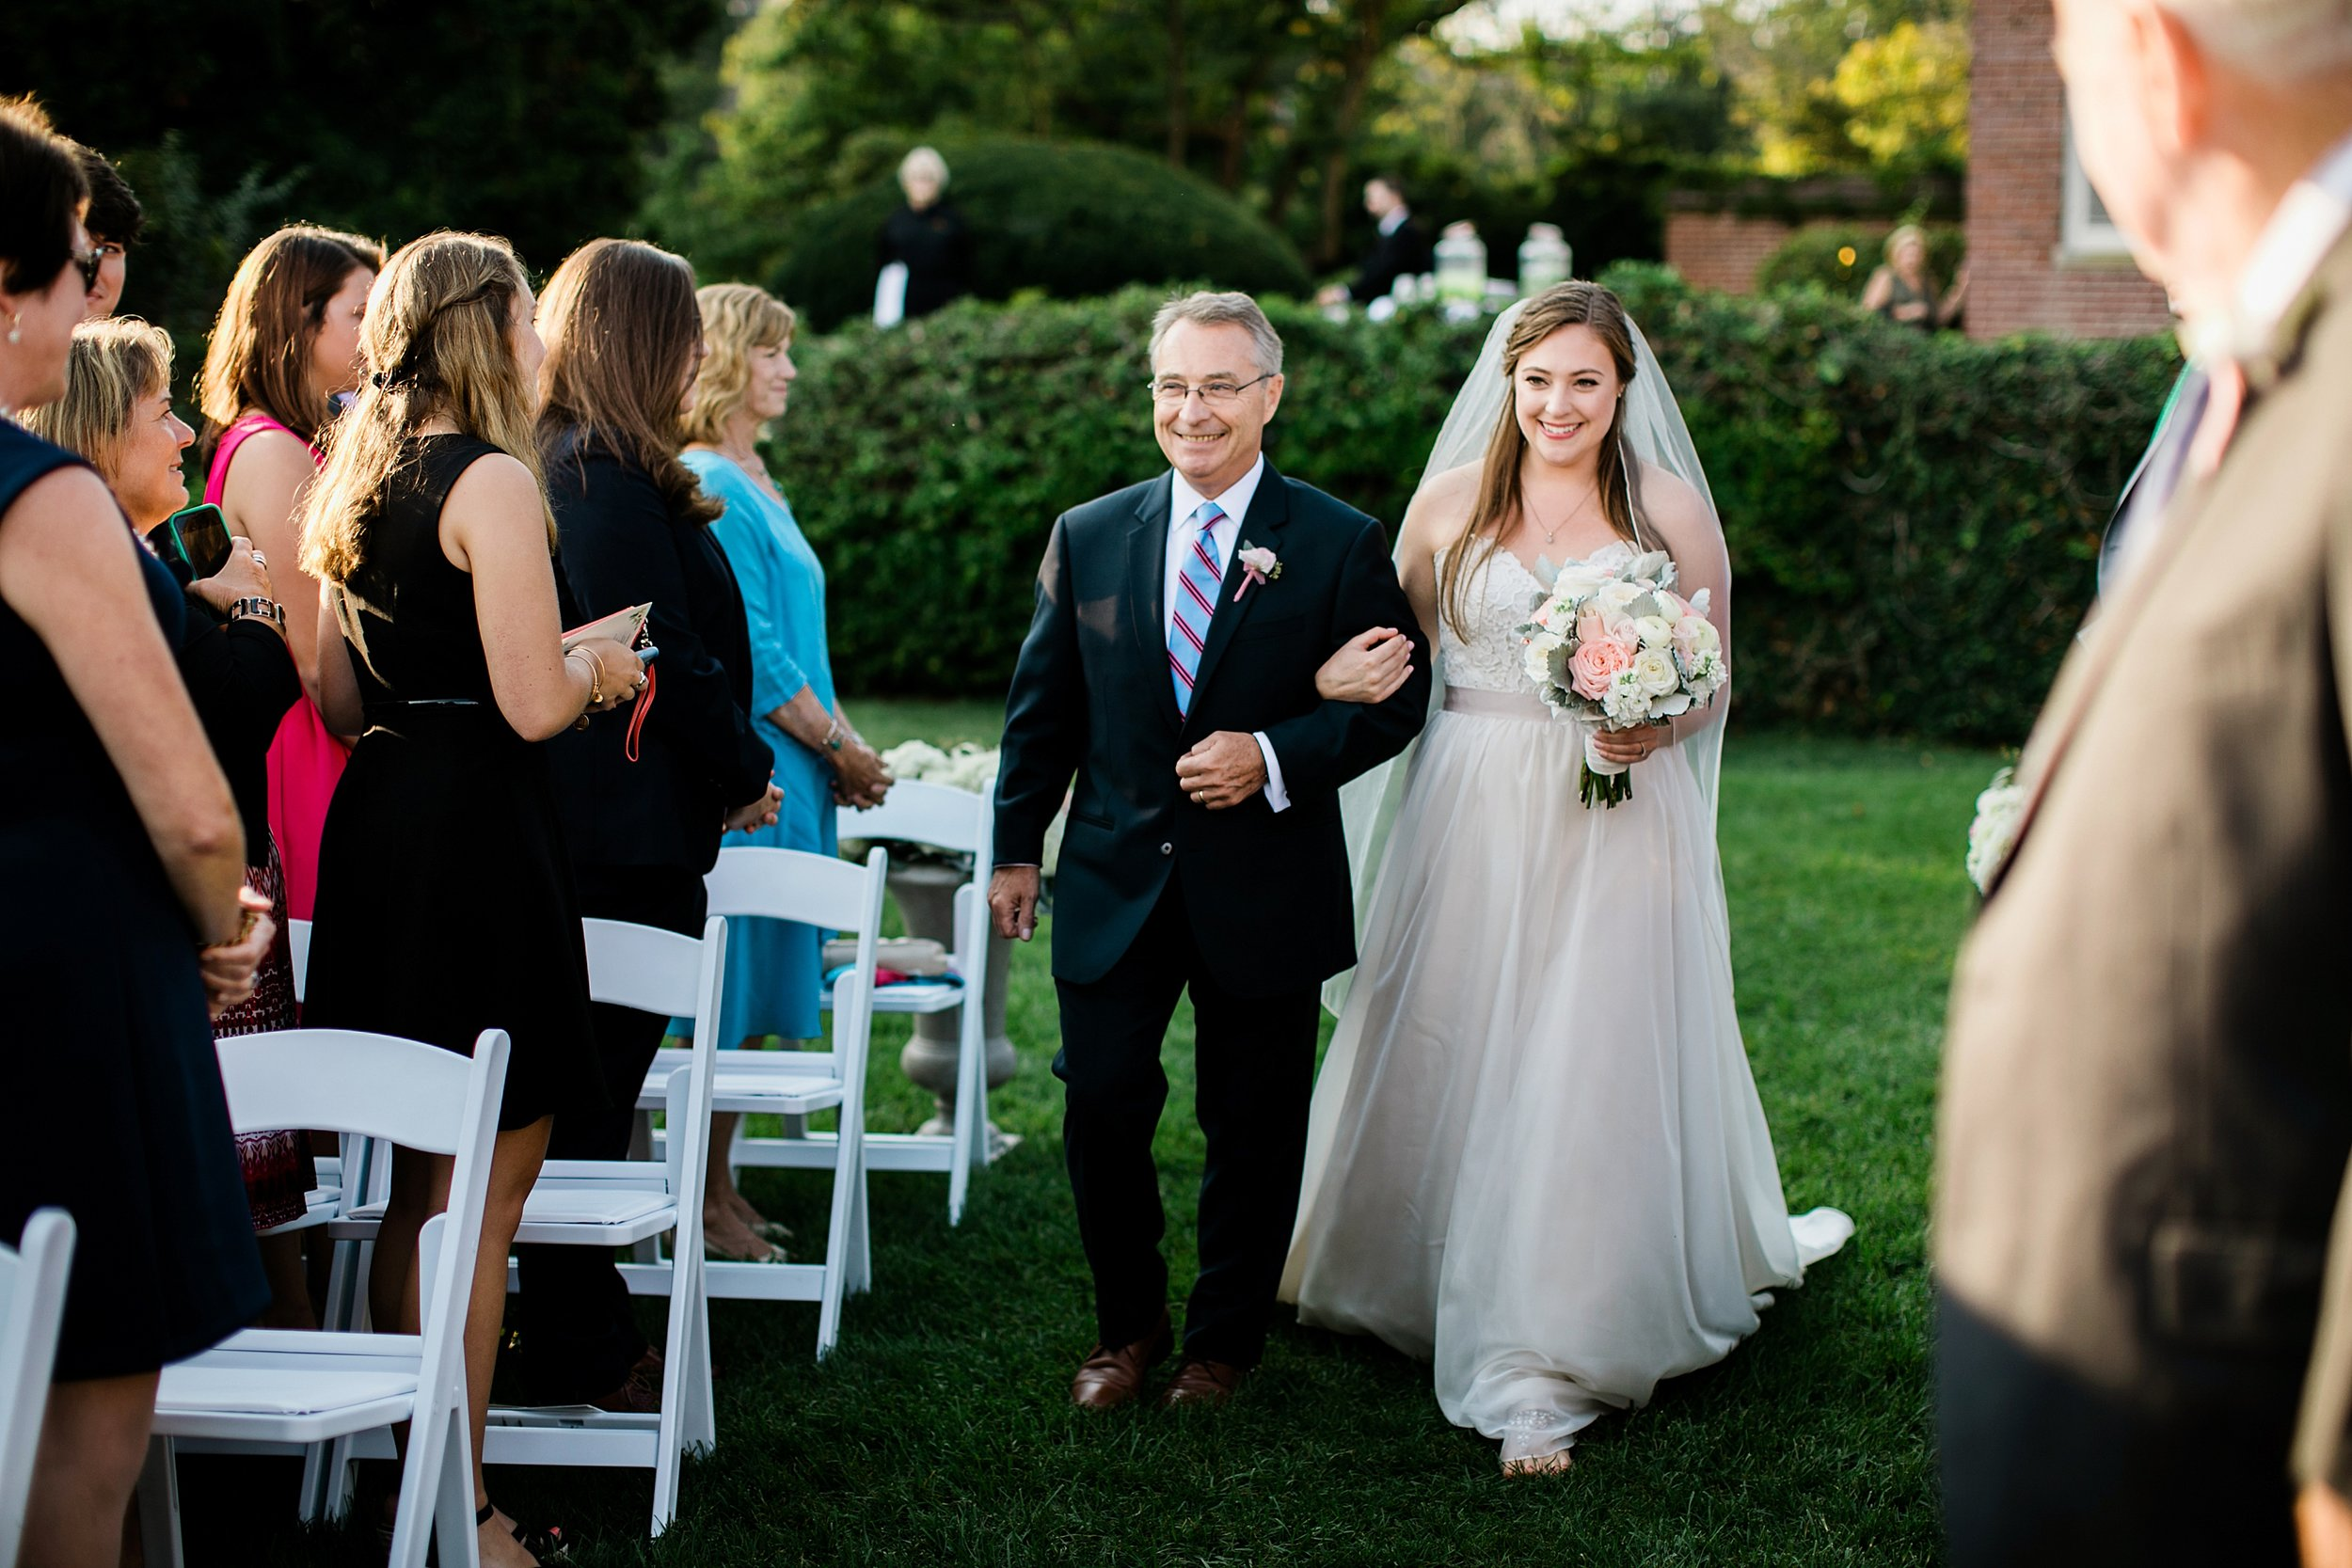 027 los angeles wedding photographer todd danforth photography boston.jpg